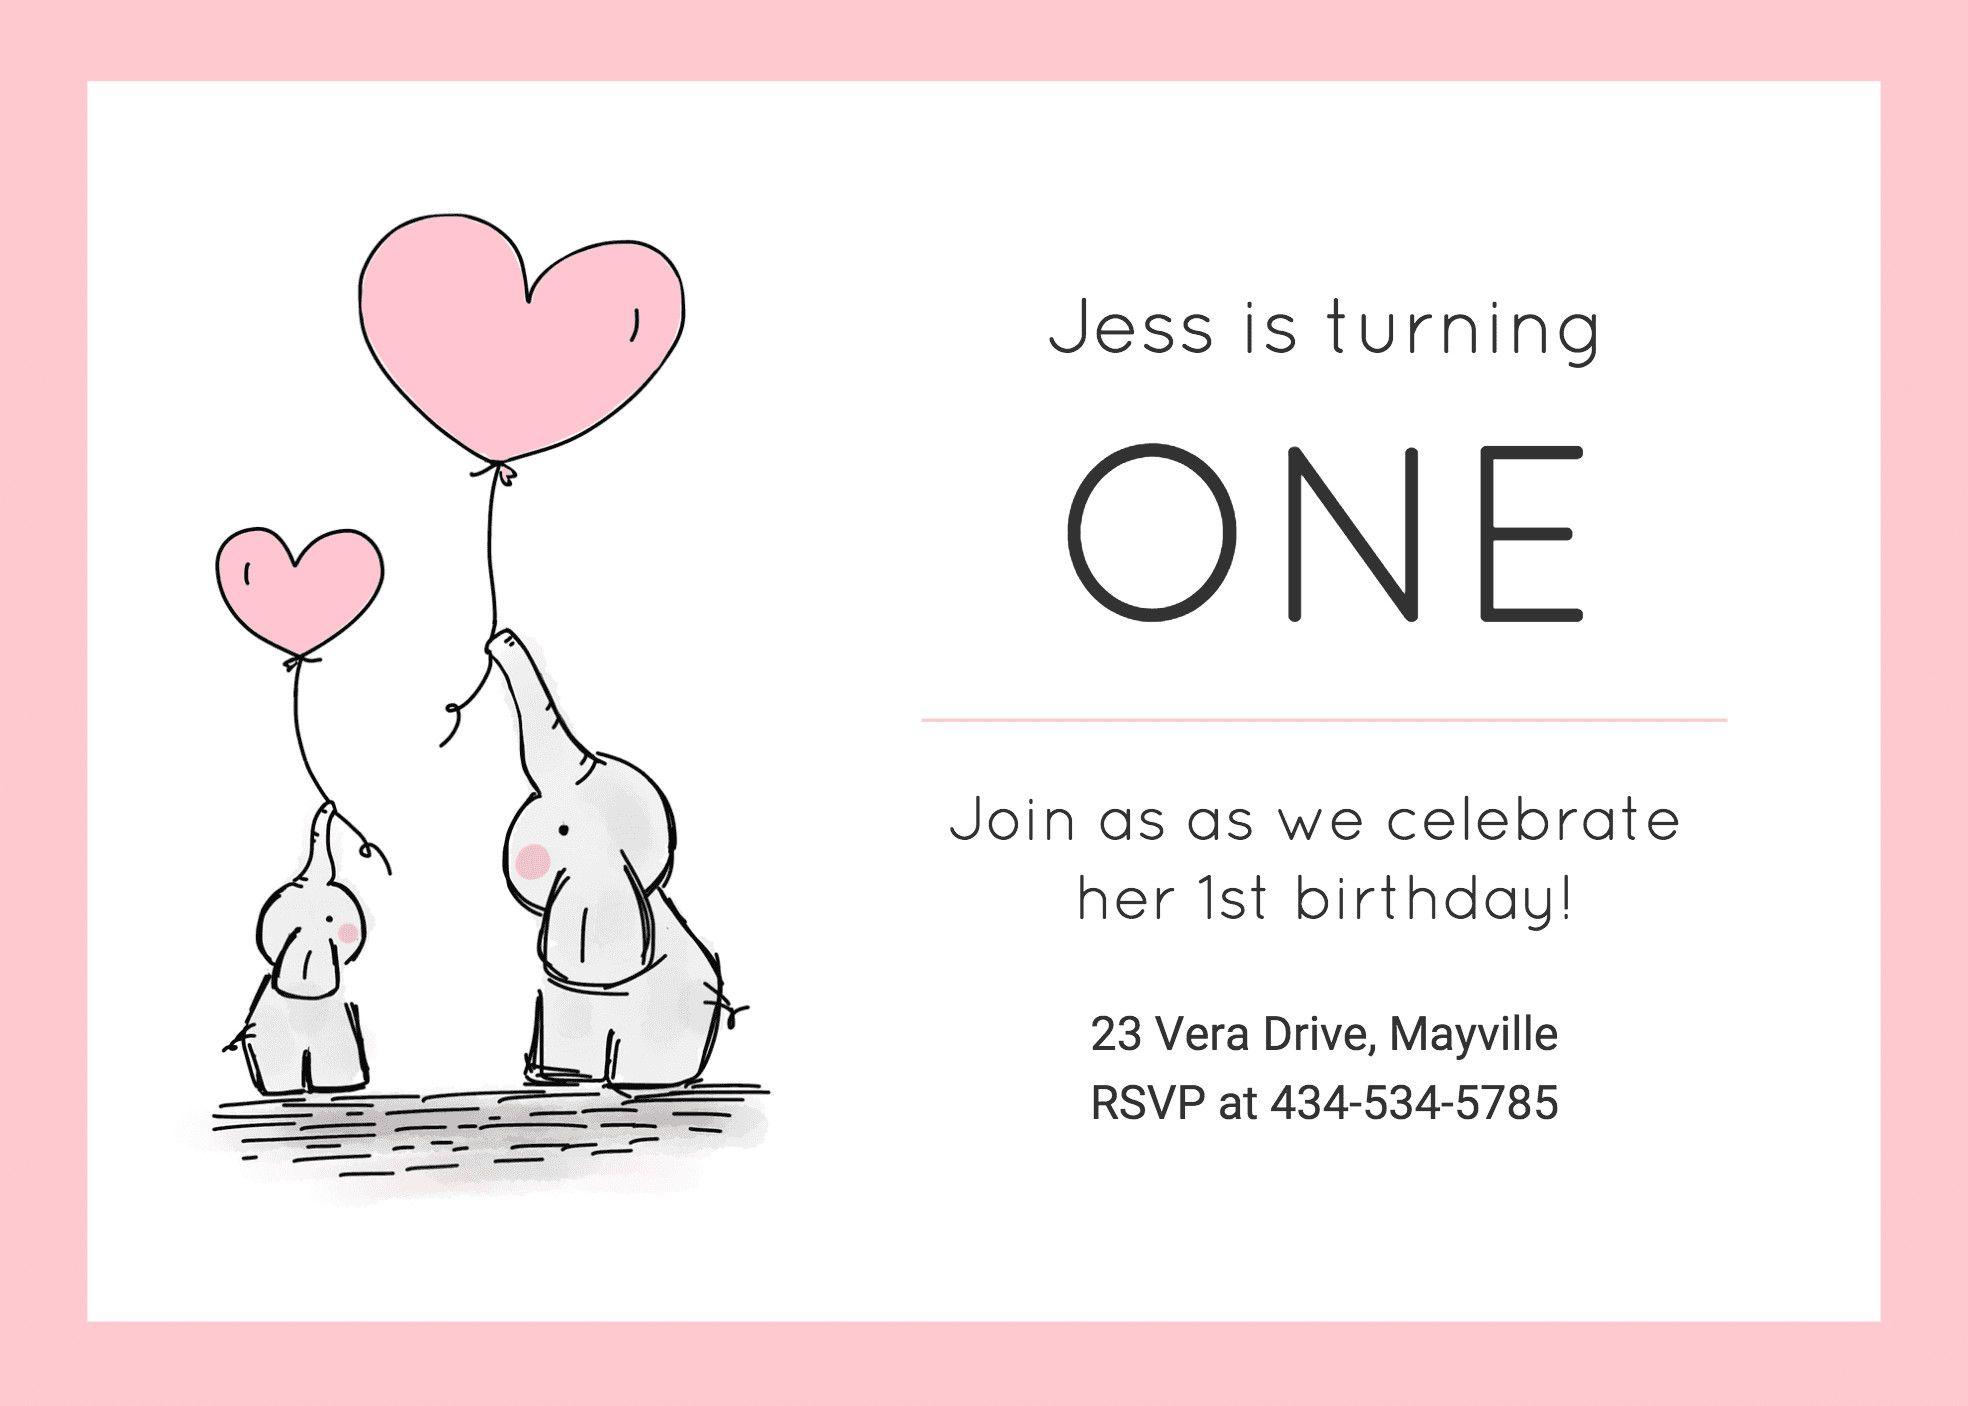 Birthday Card Invitation Template Luxury 10 Creative Birthday Invitation Birthday Invitation Card Template First Birthday Invitation Cards First Birthday Cards